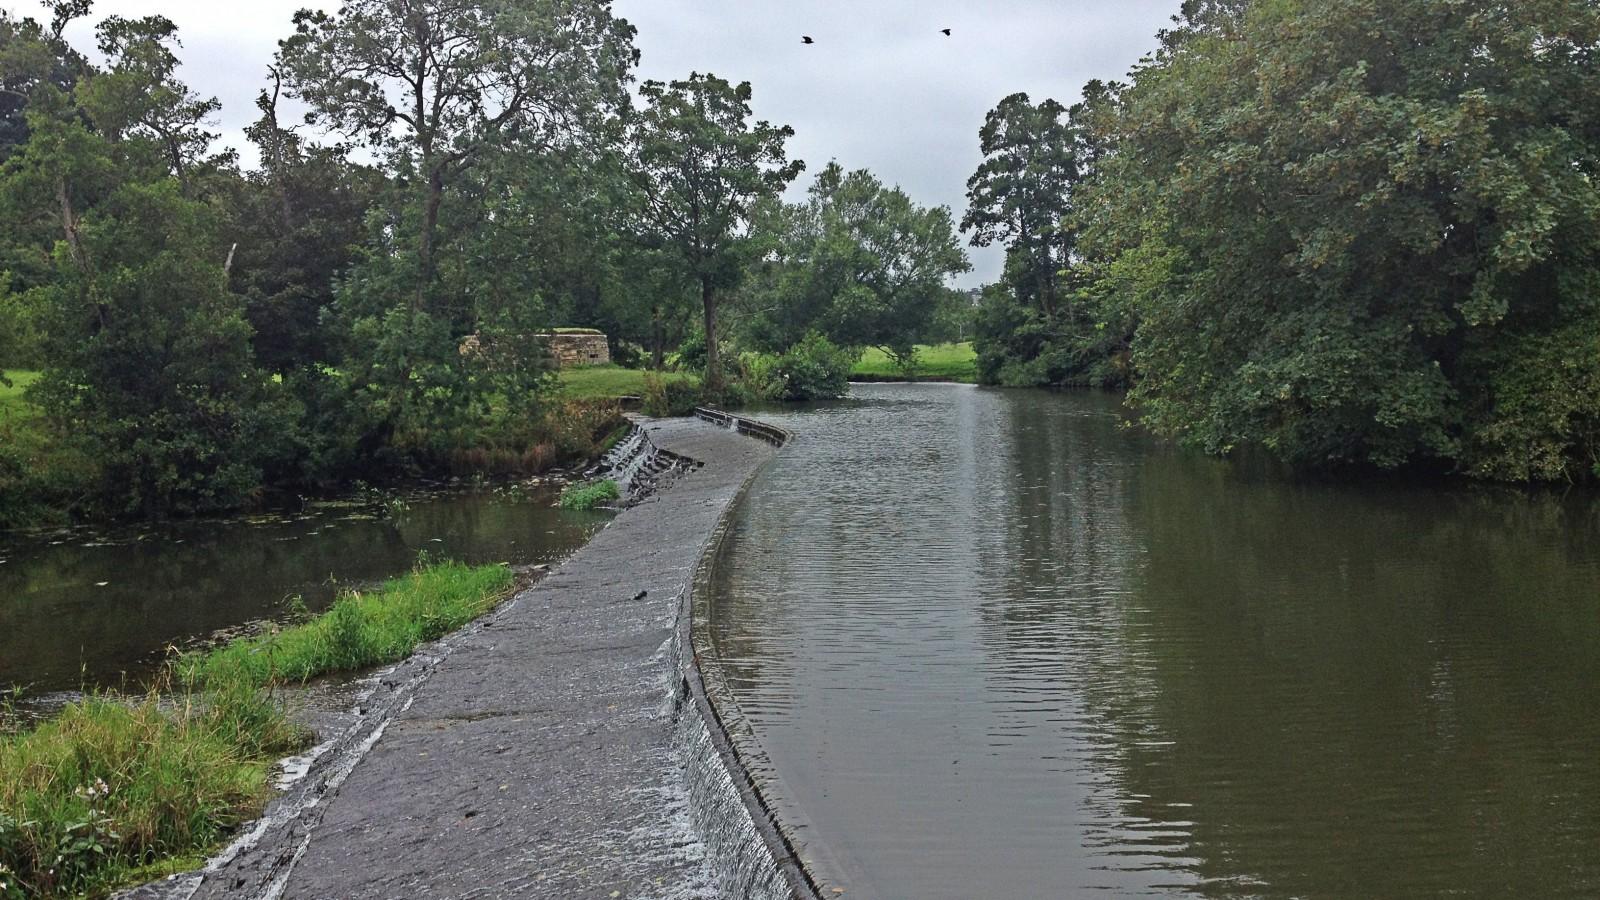 Weir at Tellisford